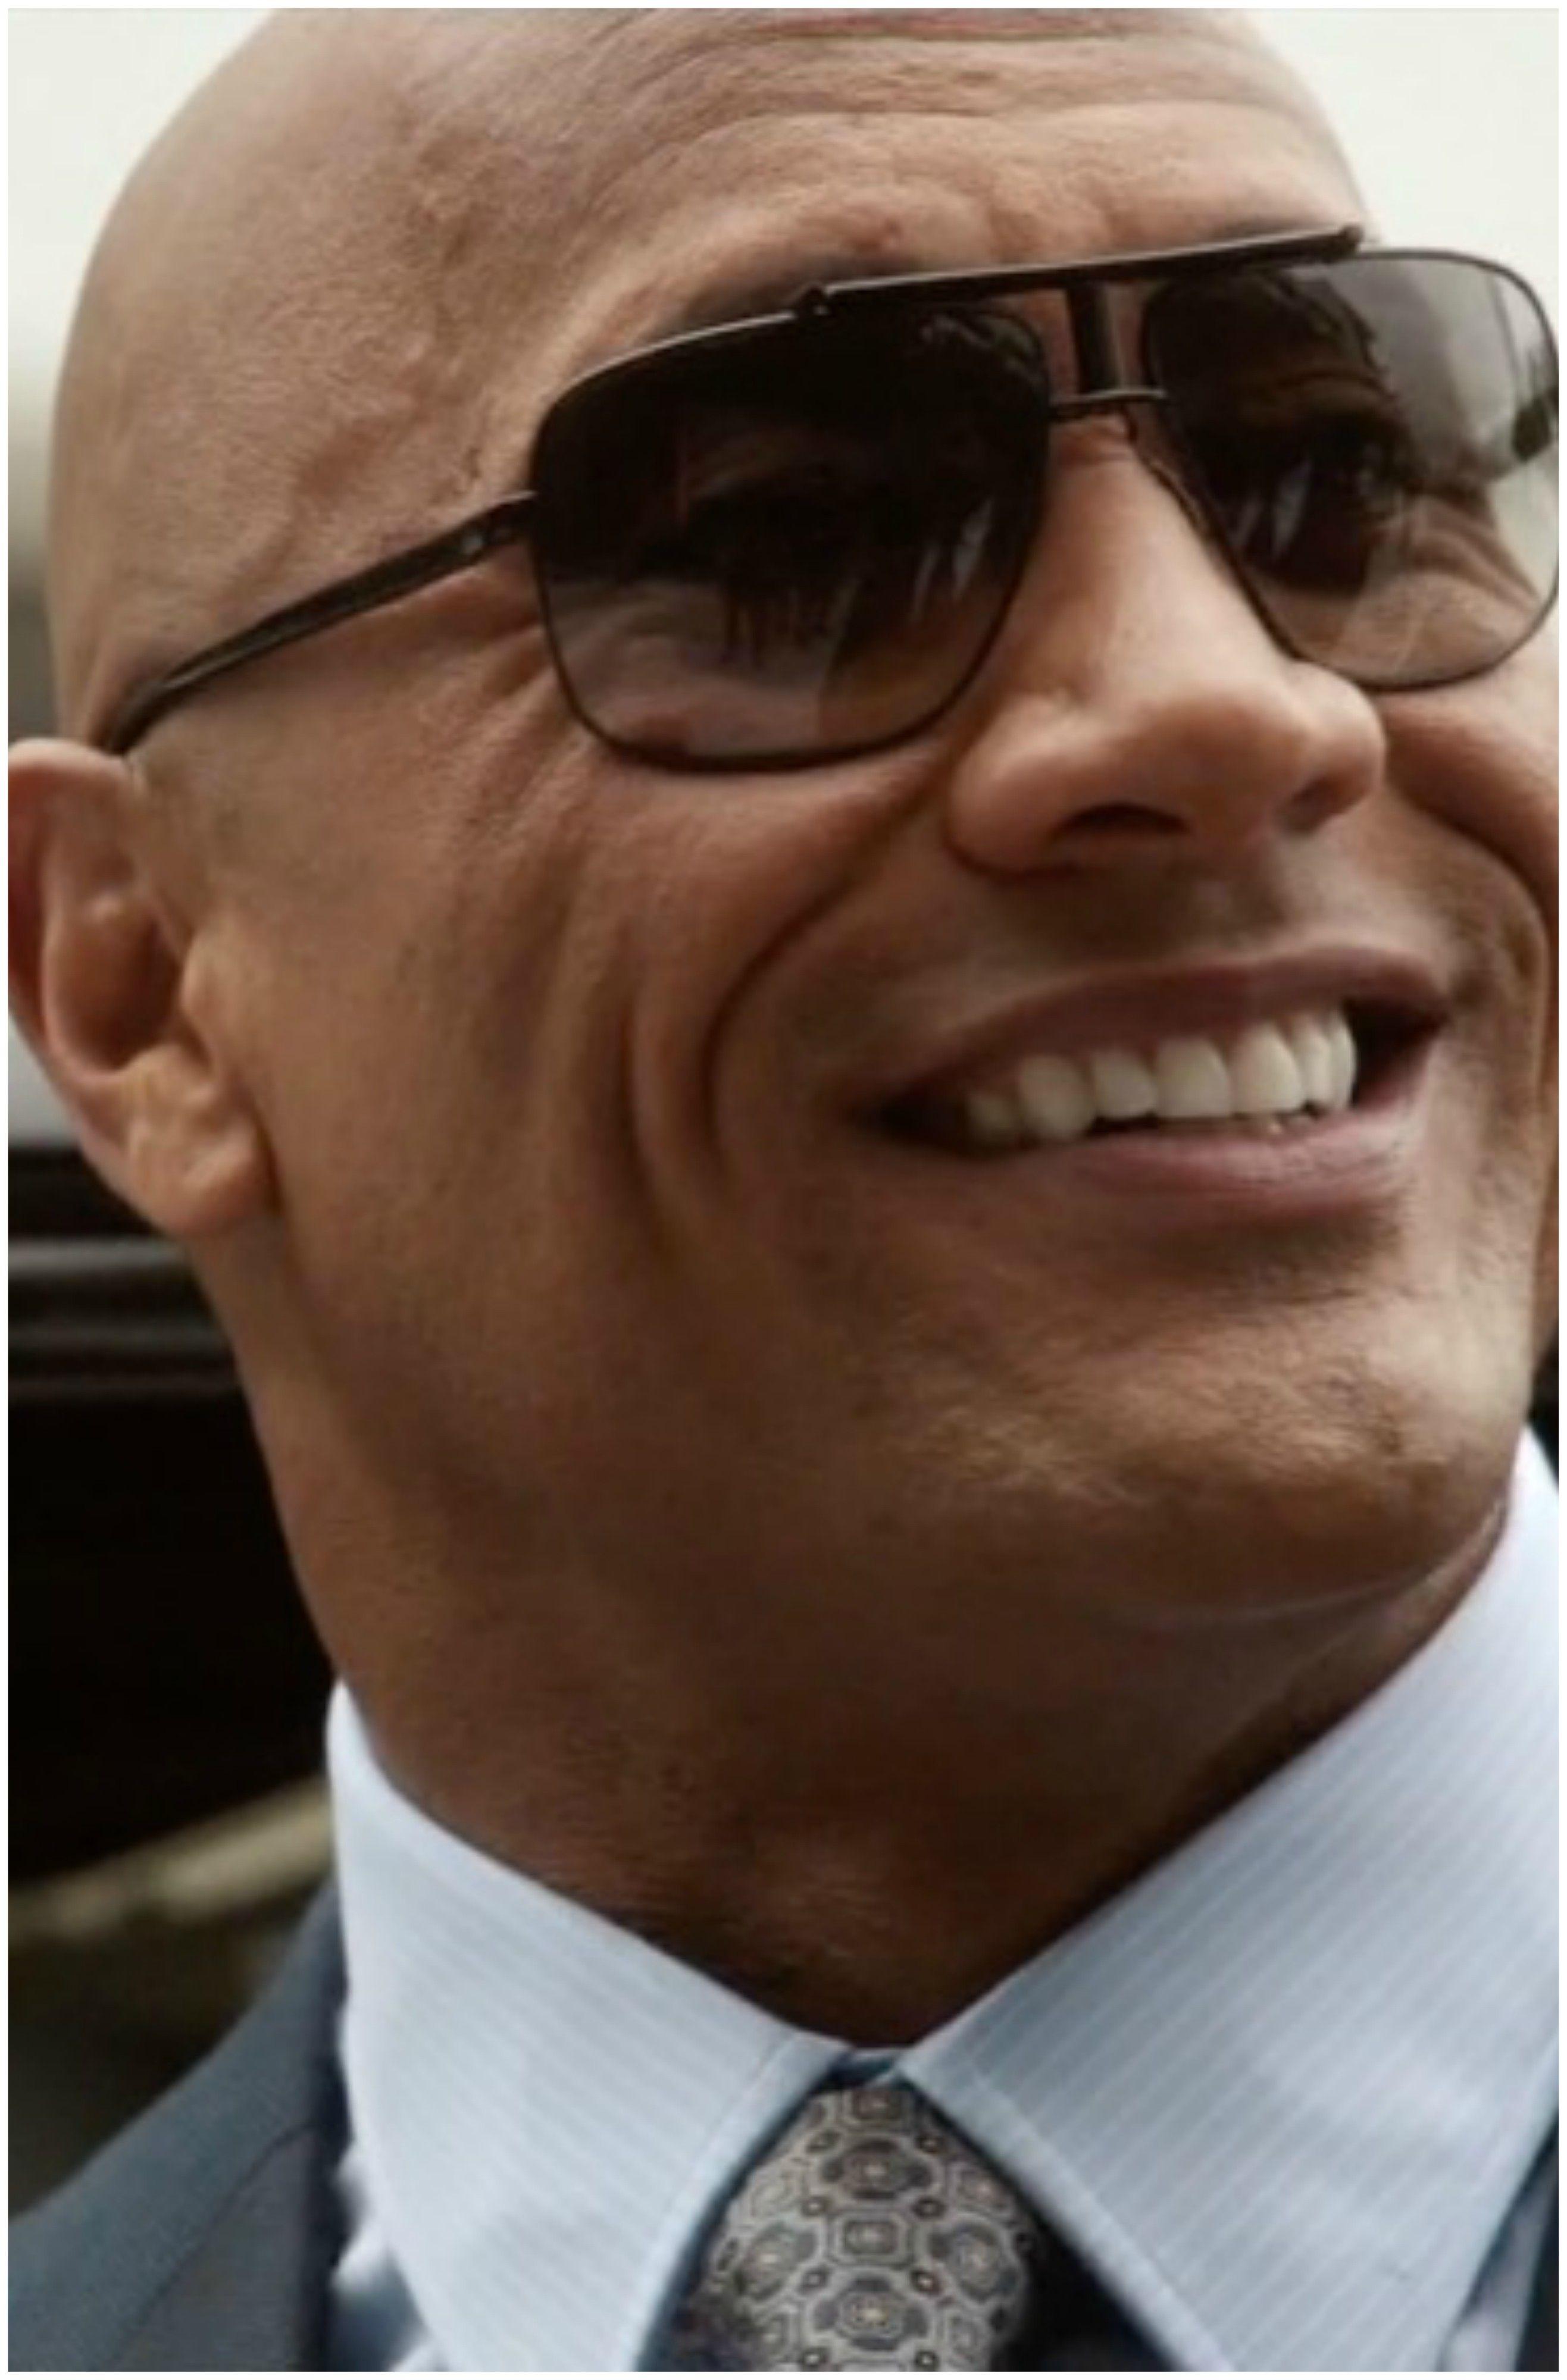 8f245067ad Dwayne Johnson (The Rock) wears Aviator sunglasses.